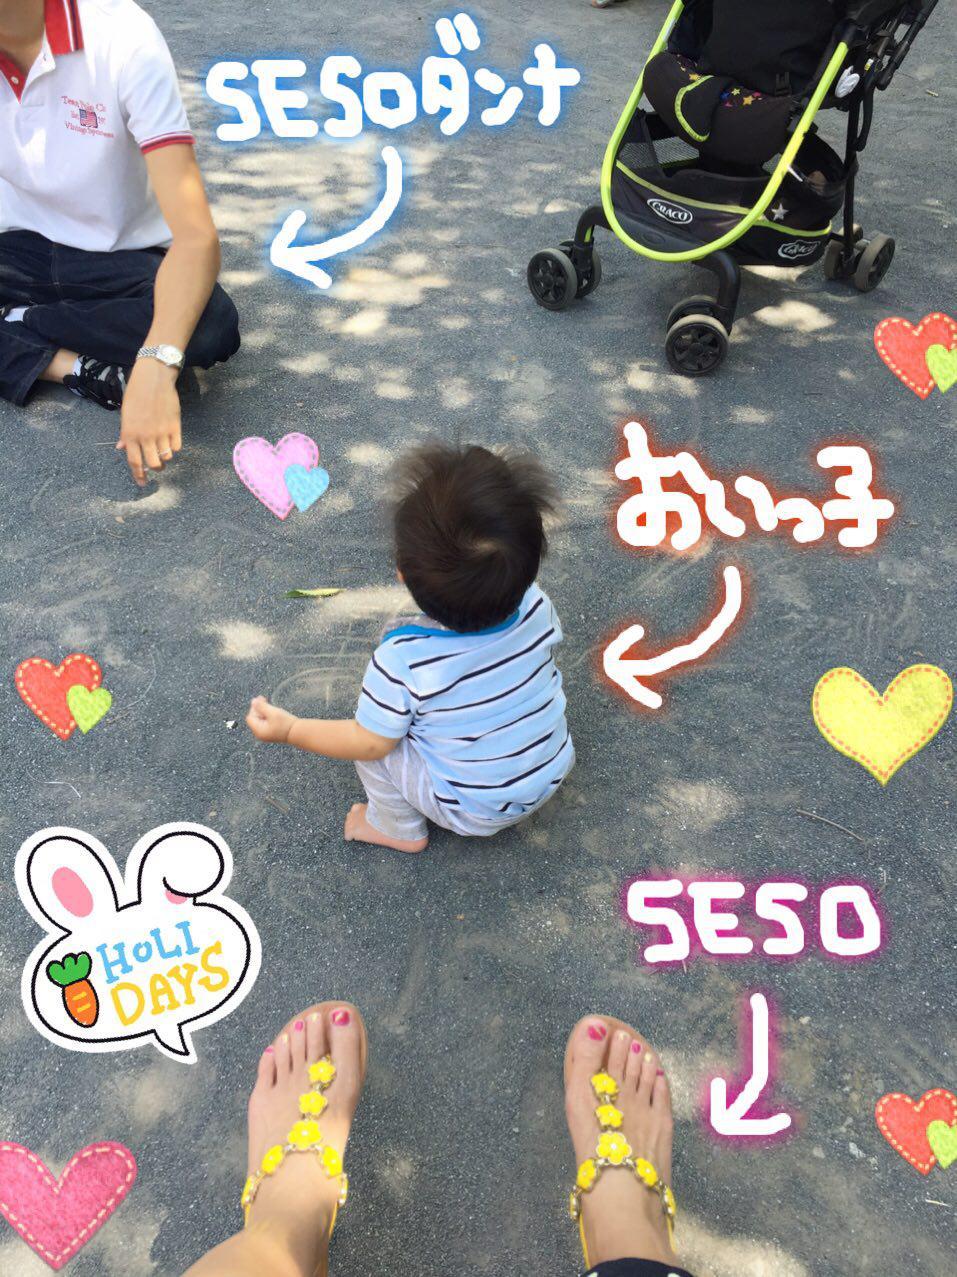 photo_2017-06-18_00-01-38.jpg